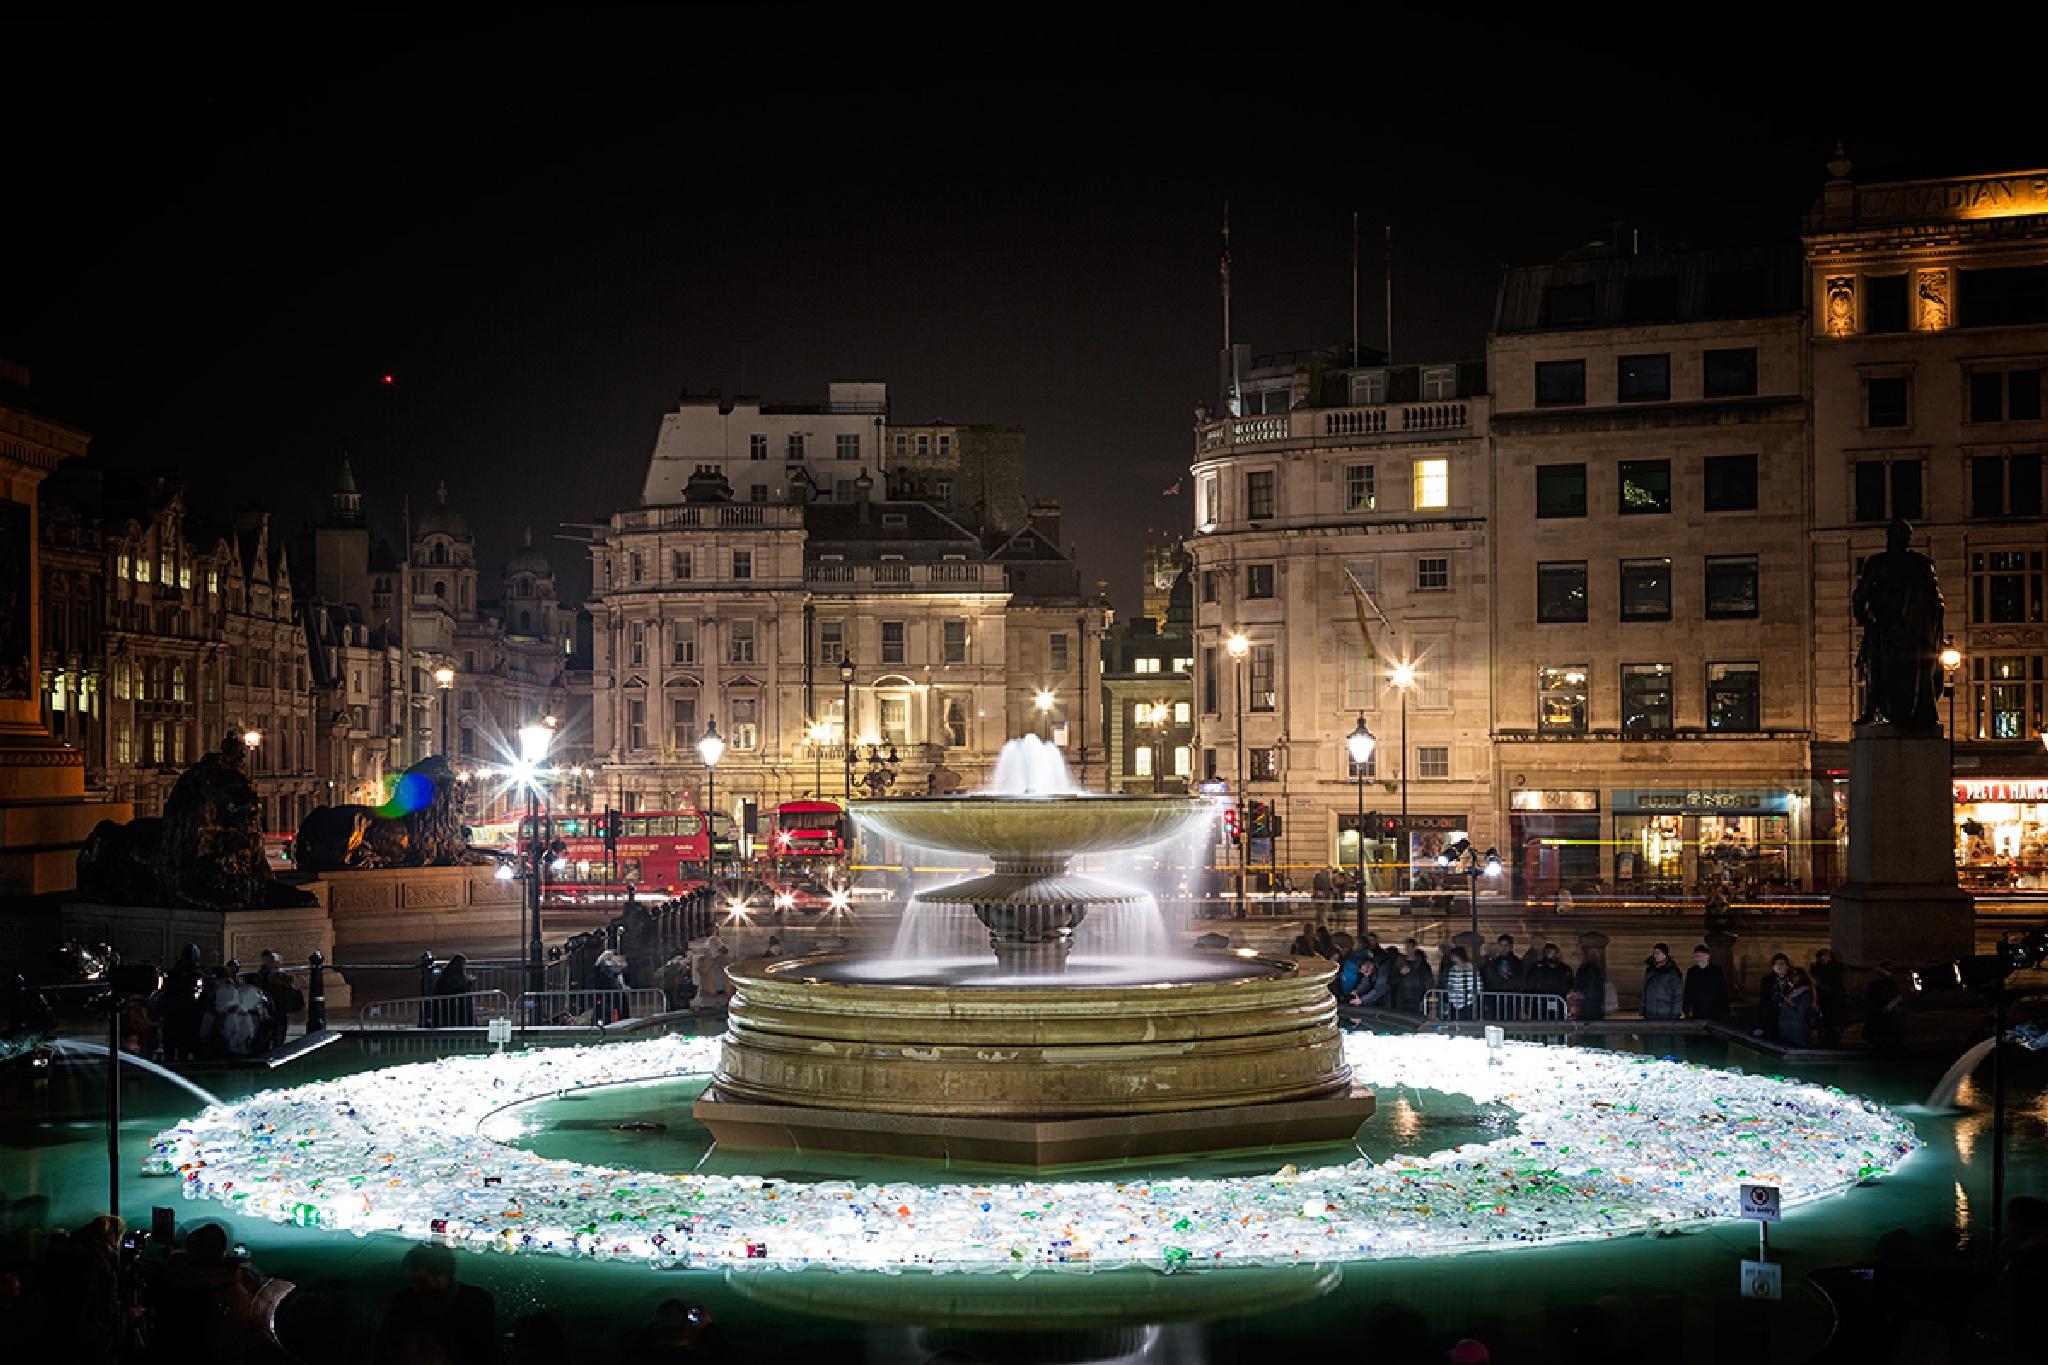 Plastic Islands at Trafalgar Square by cat66chapman